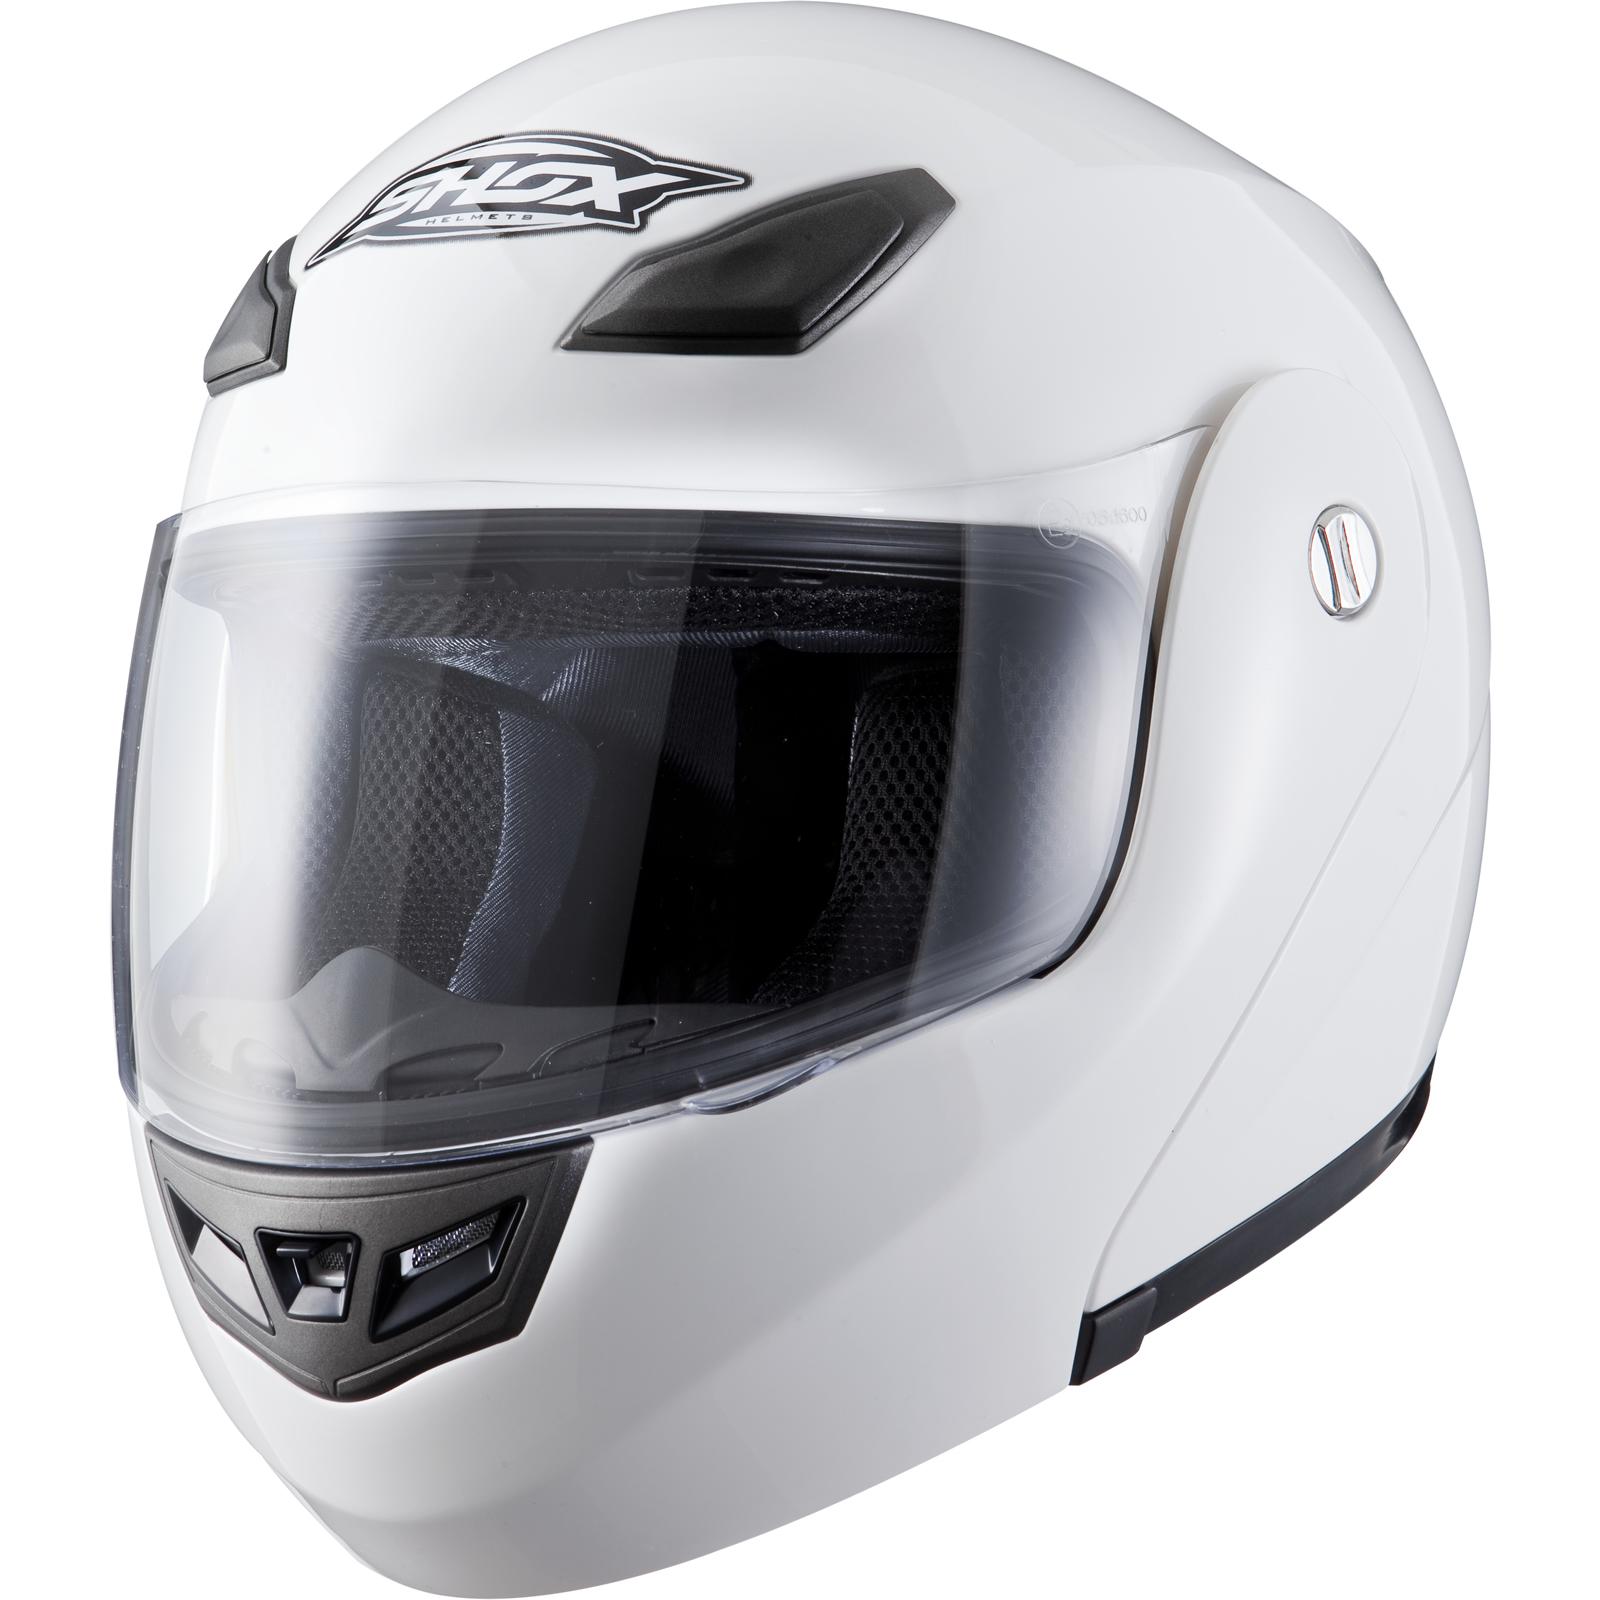 Shox Bullet Moto Scooter Motard Motarde Casque Modulable Avec Visière